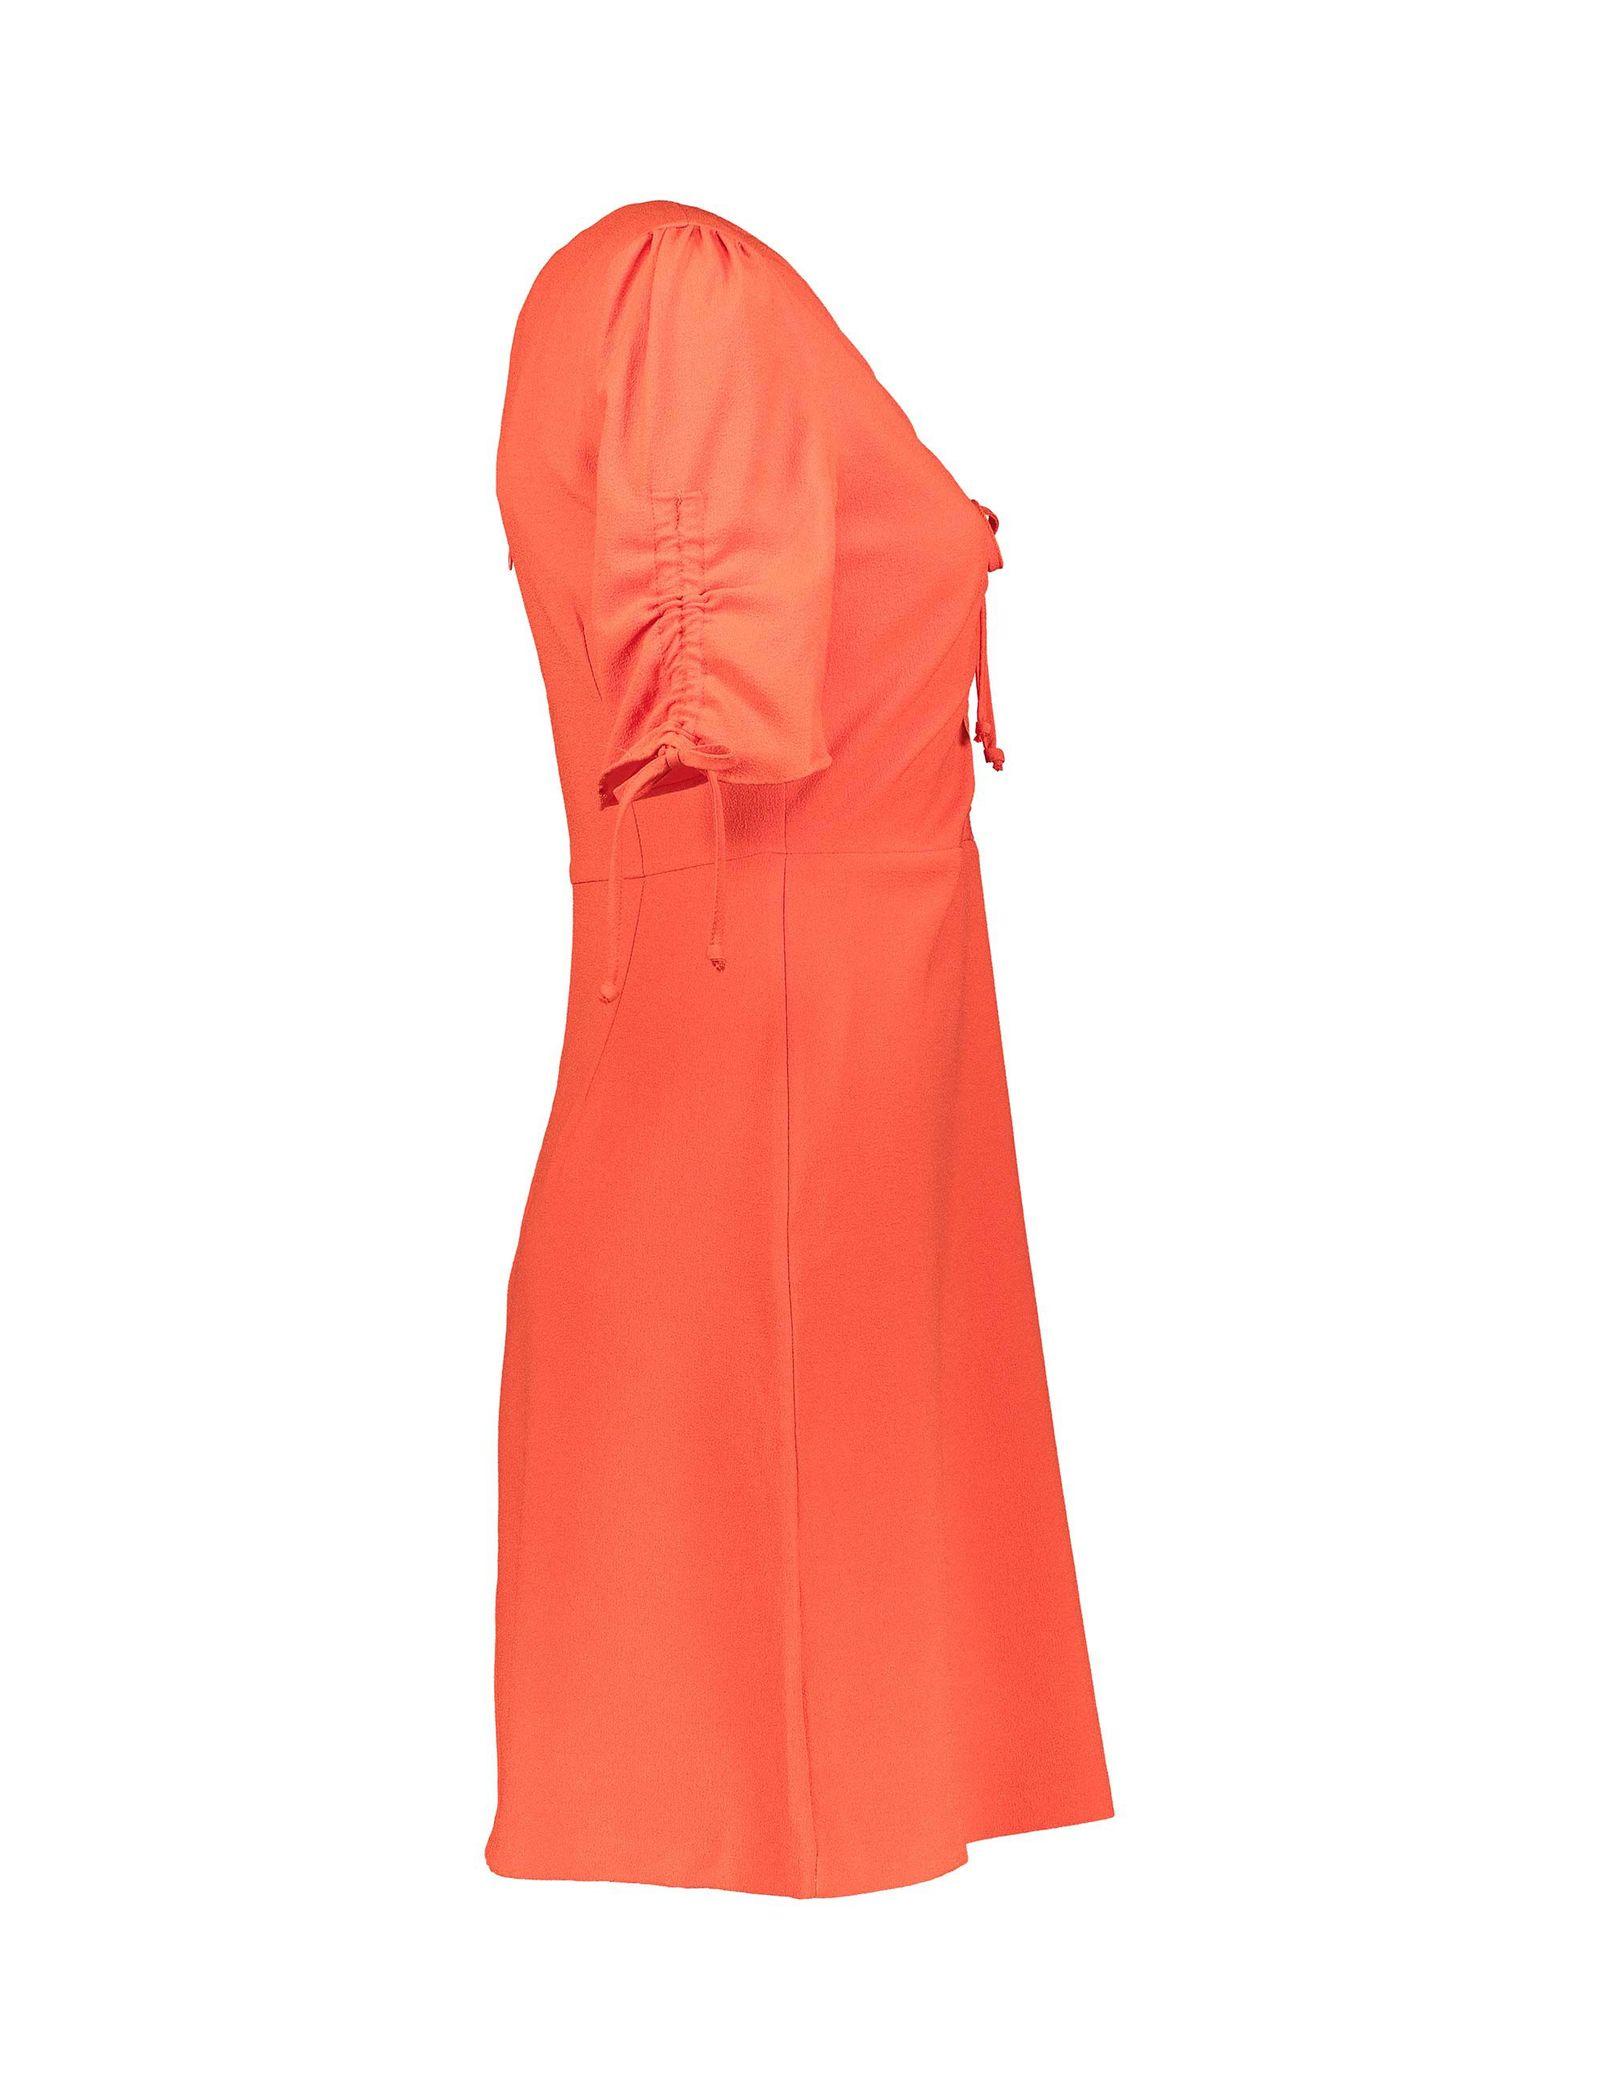 پیراهن کوتاه زنانه - کوتون - قرمز - 3